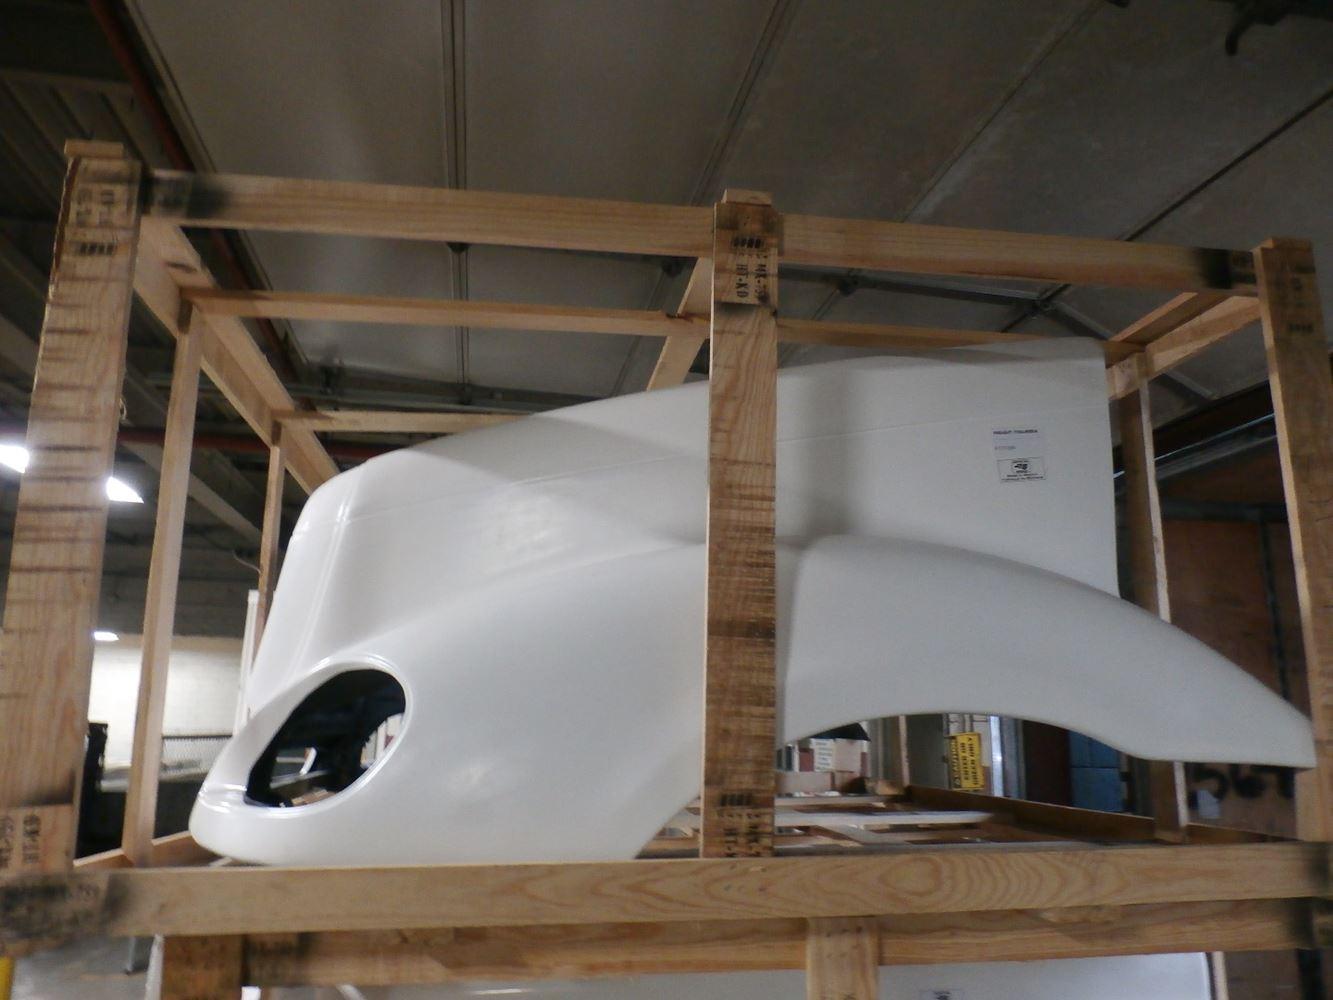 Media 3 for Freightliner COLUMBIA Hoods